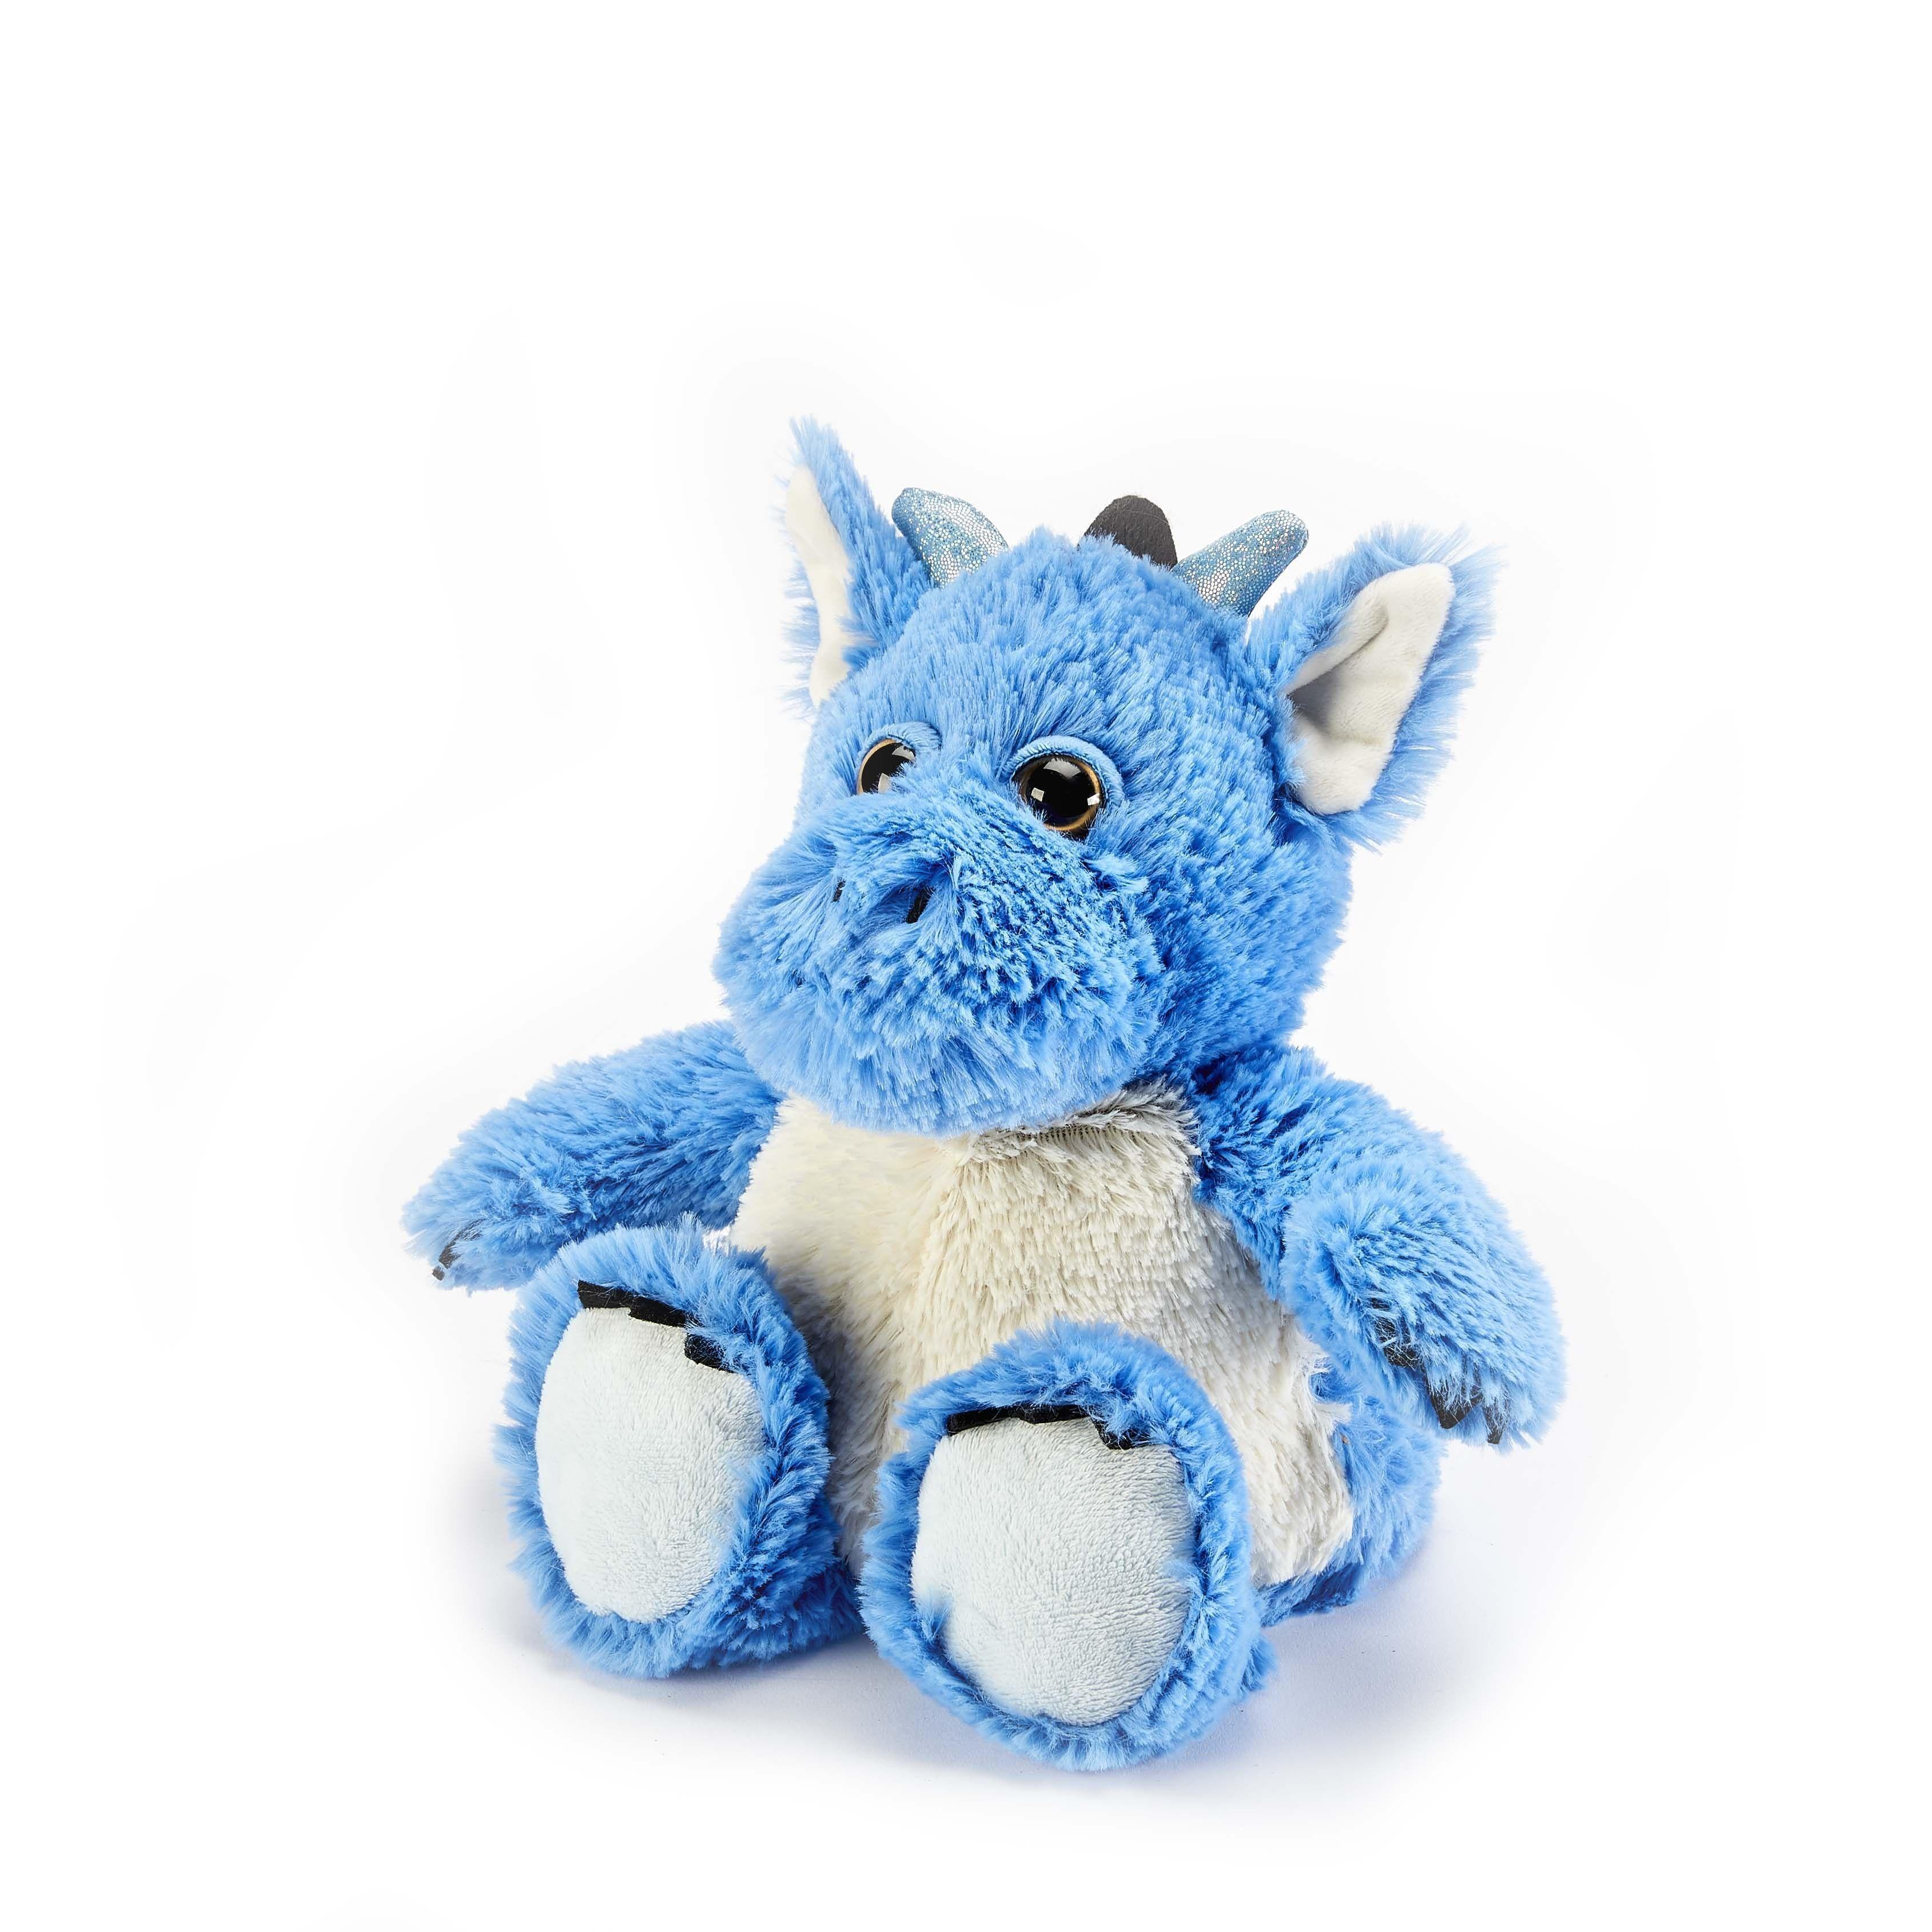 Warmies Dragon Blue Microwavable Cozy Plush Soft Toy